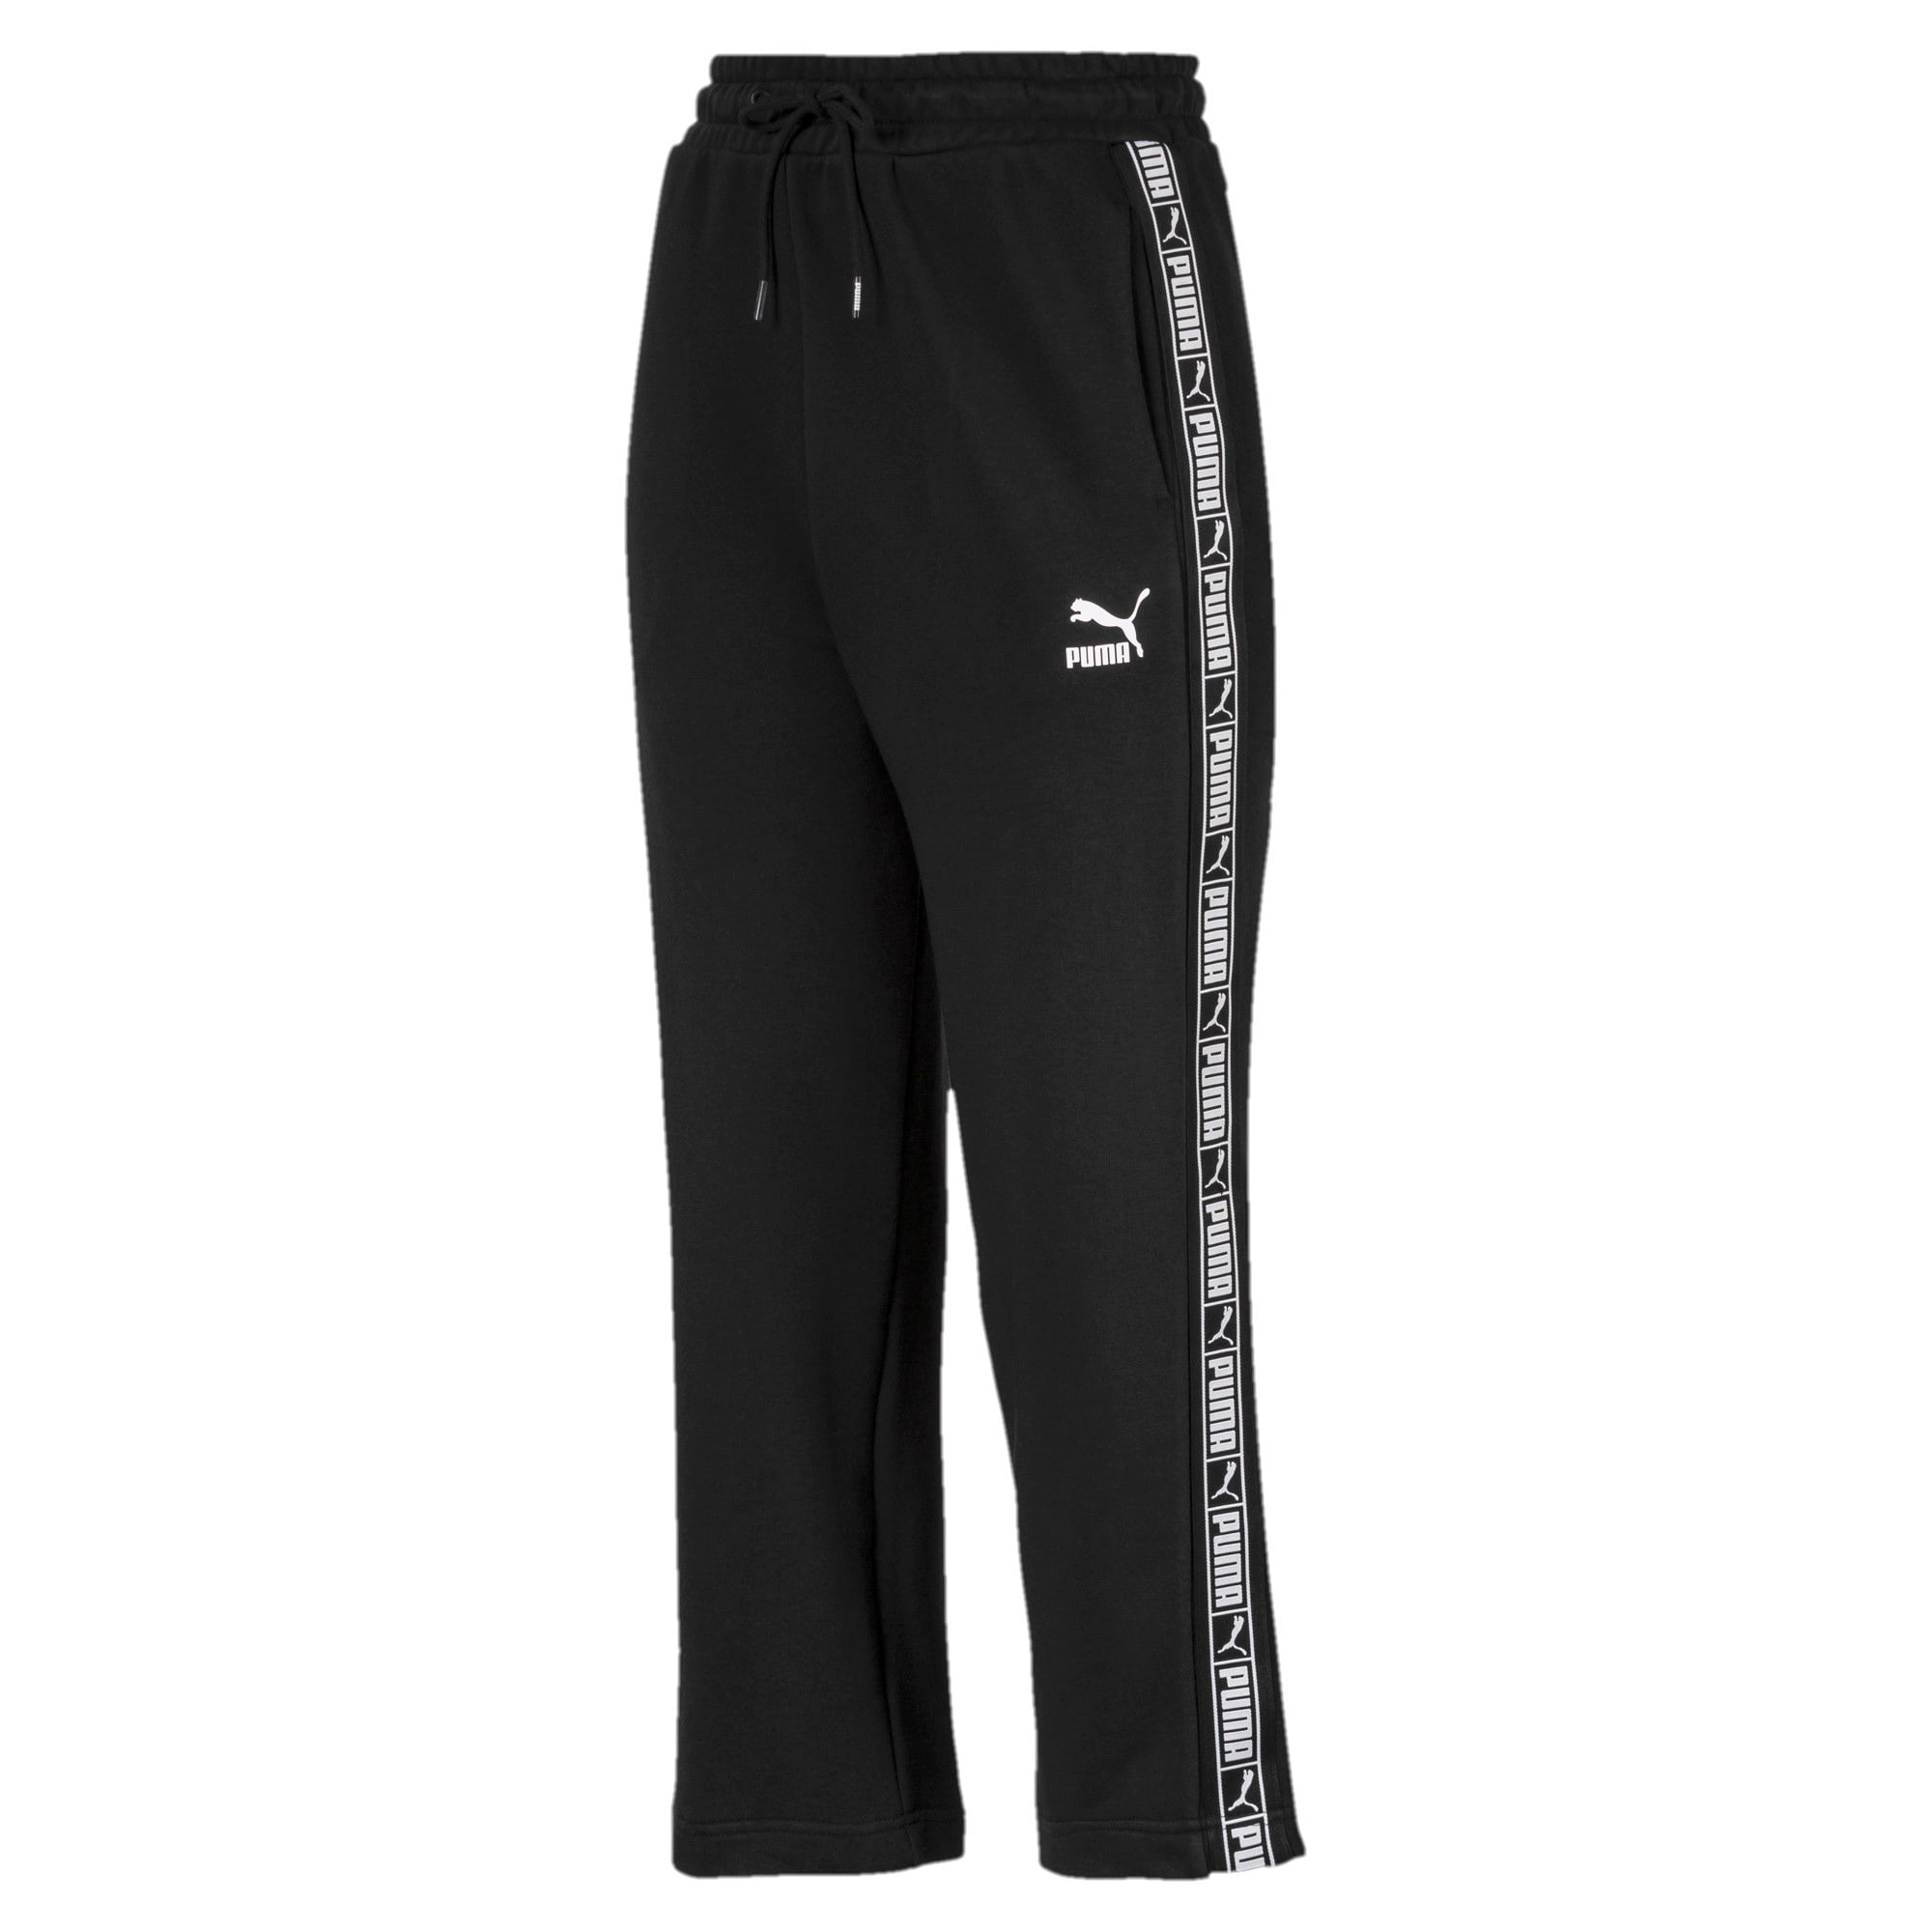 Thumbnail 1 of Classics Women's Track Pants, Puma Black, medium